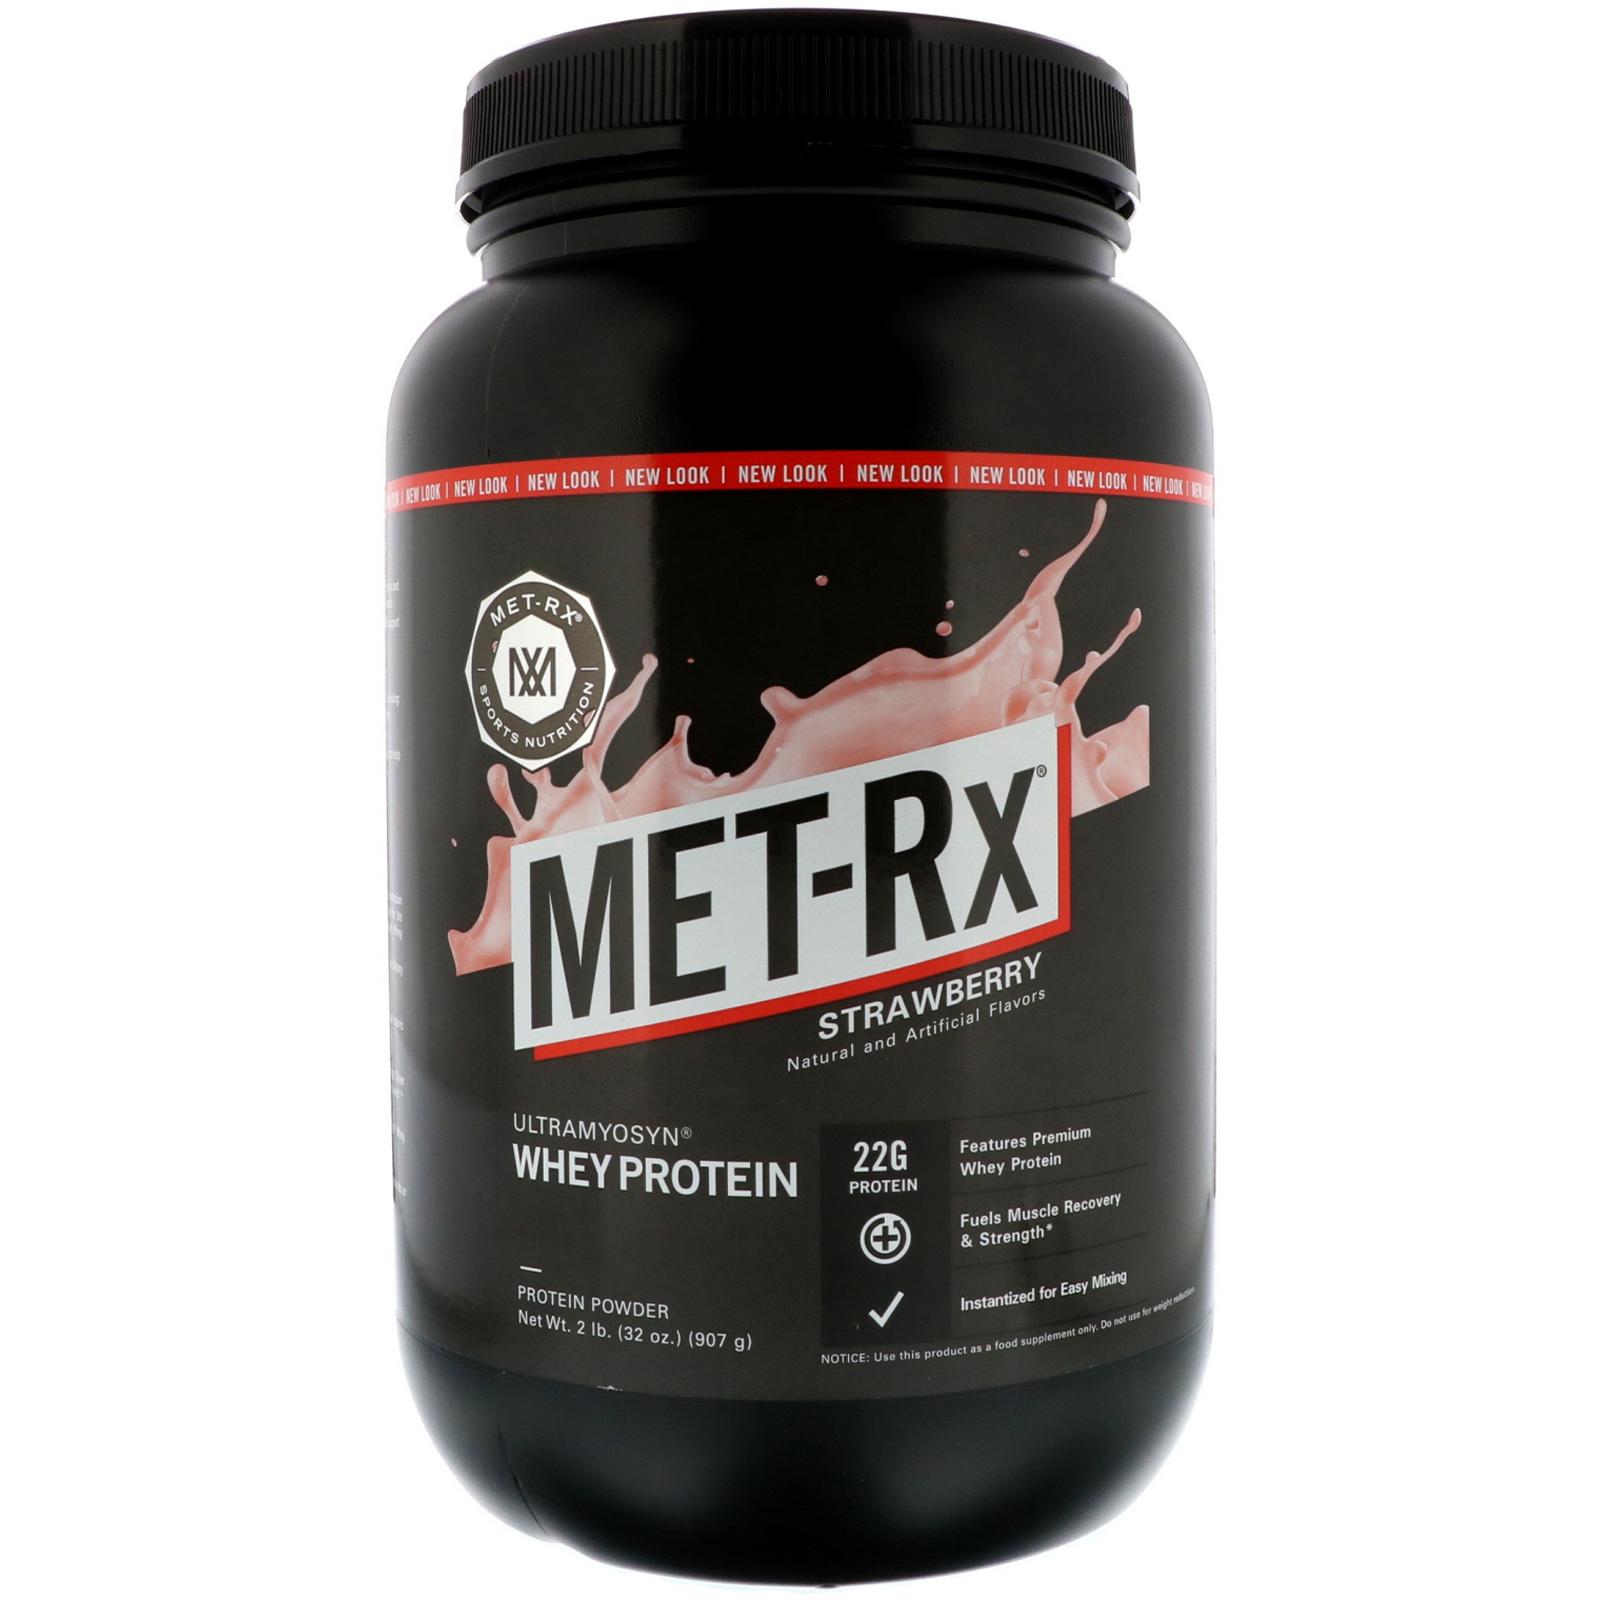 ultramyosyn whey isolate met-rx protein as para bajar de peso